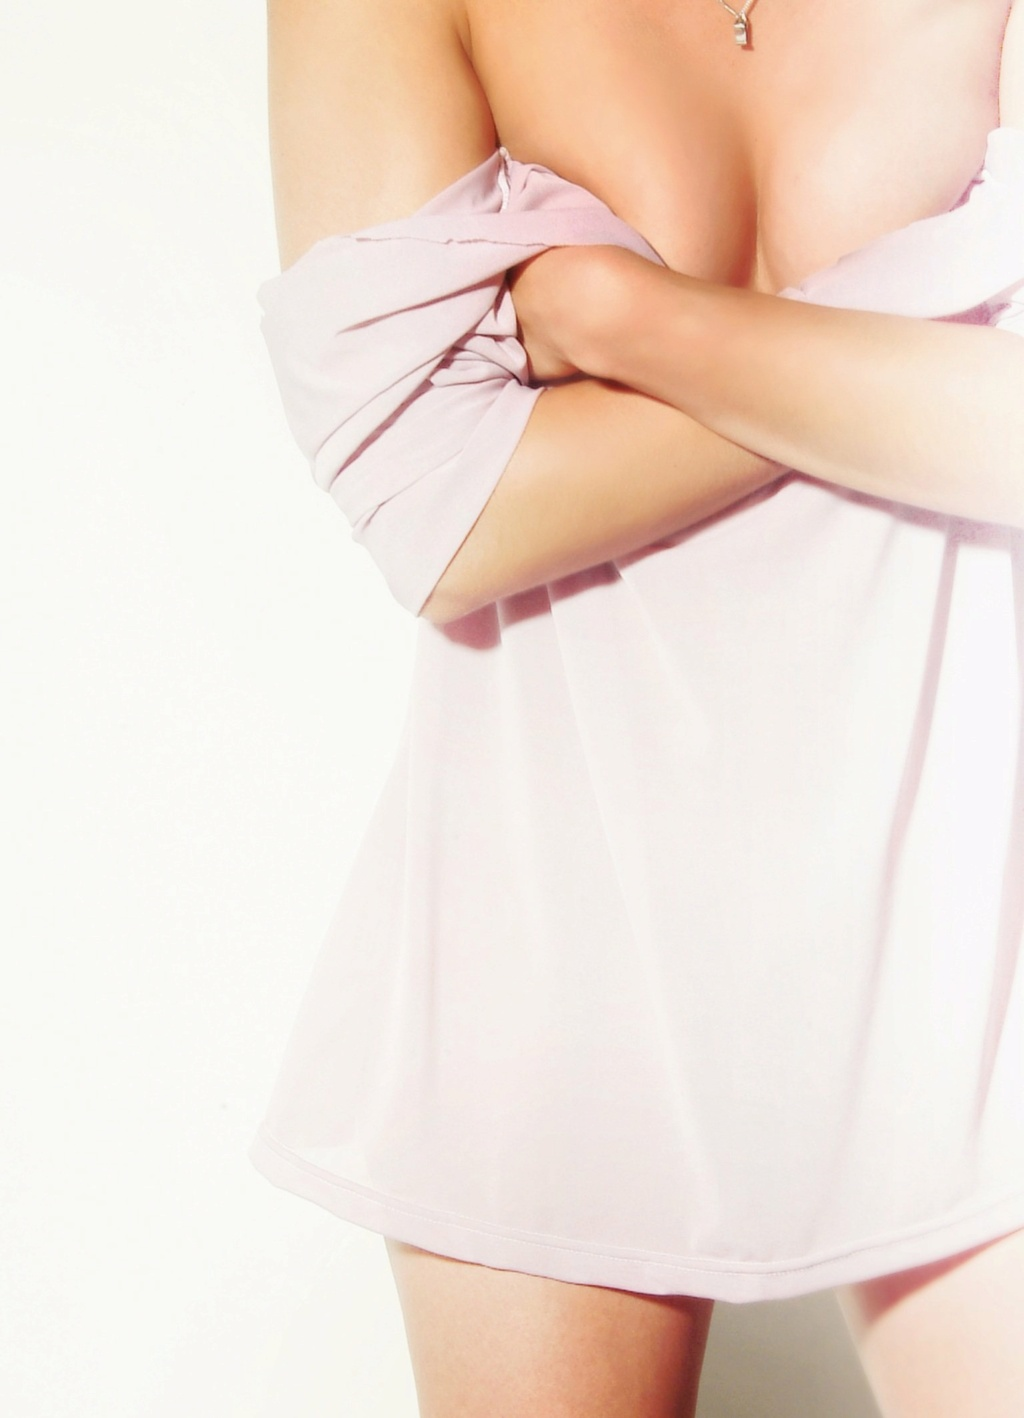 Путь косметолога / массажиста / мастера салона красоты Woman-35